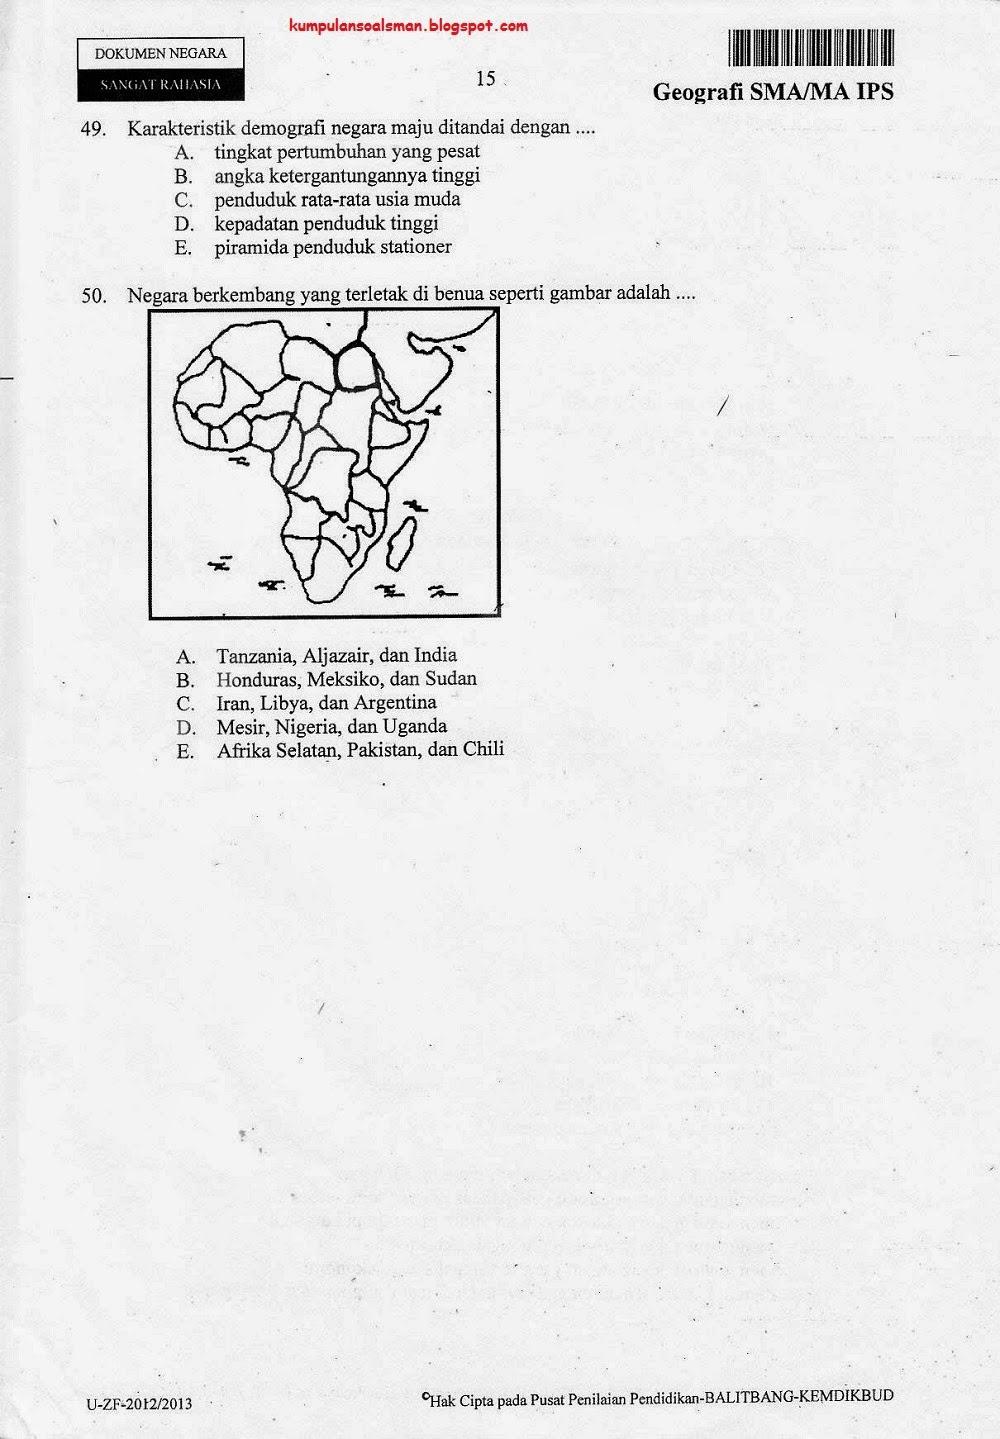 Prediksi Soal Un Us Try Out Geografi Kelas 3 Sma Ips Kode 7 Ta 2012 2013 Download Soal Sma Ma